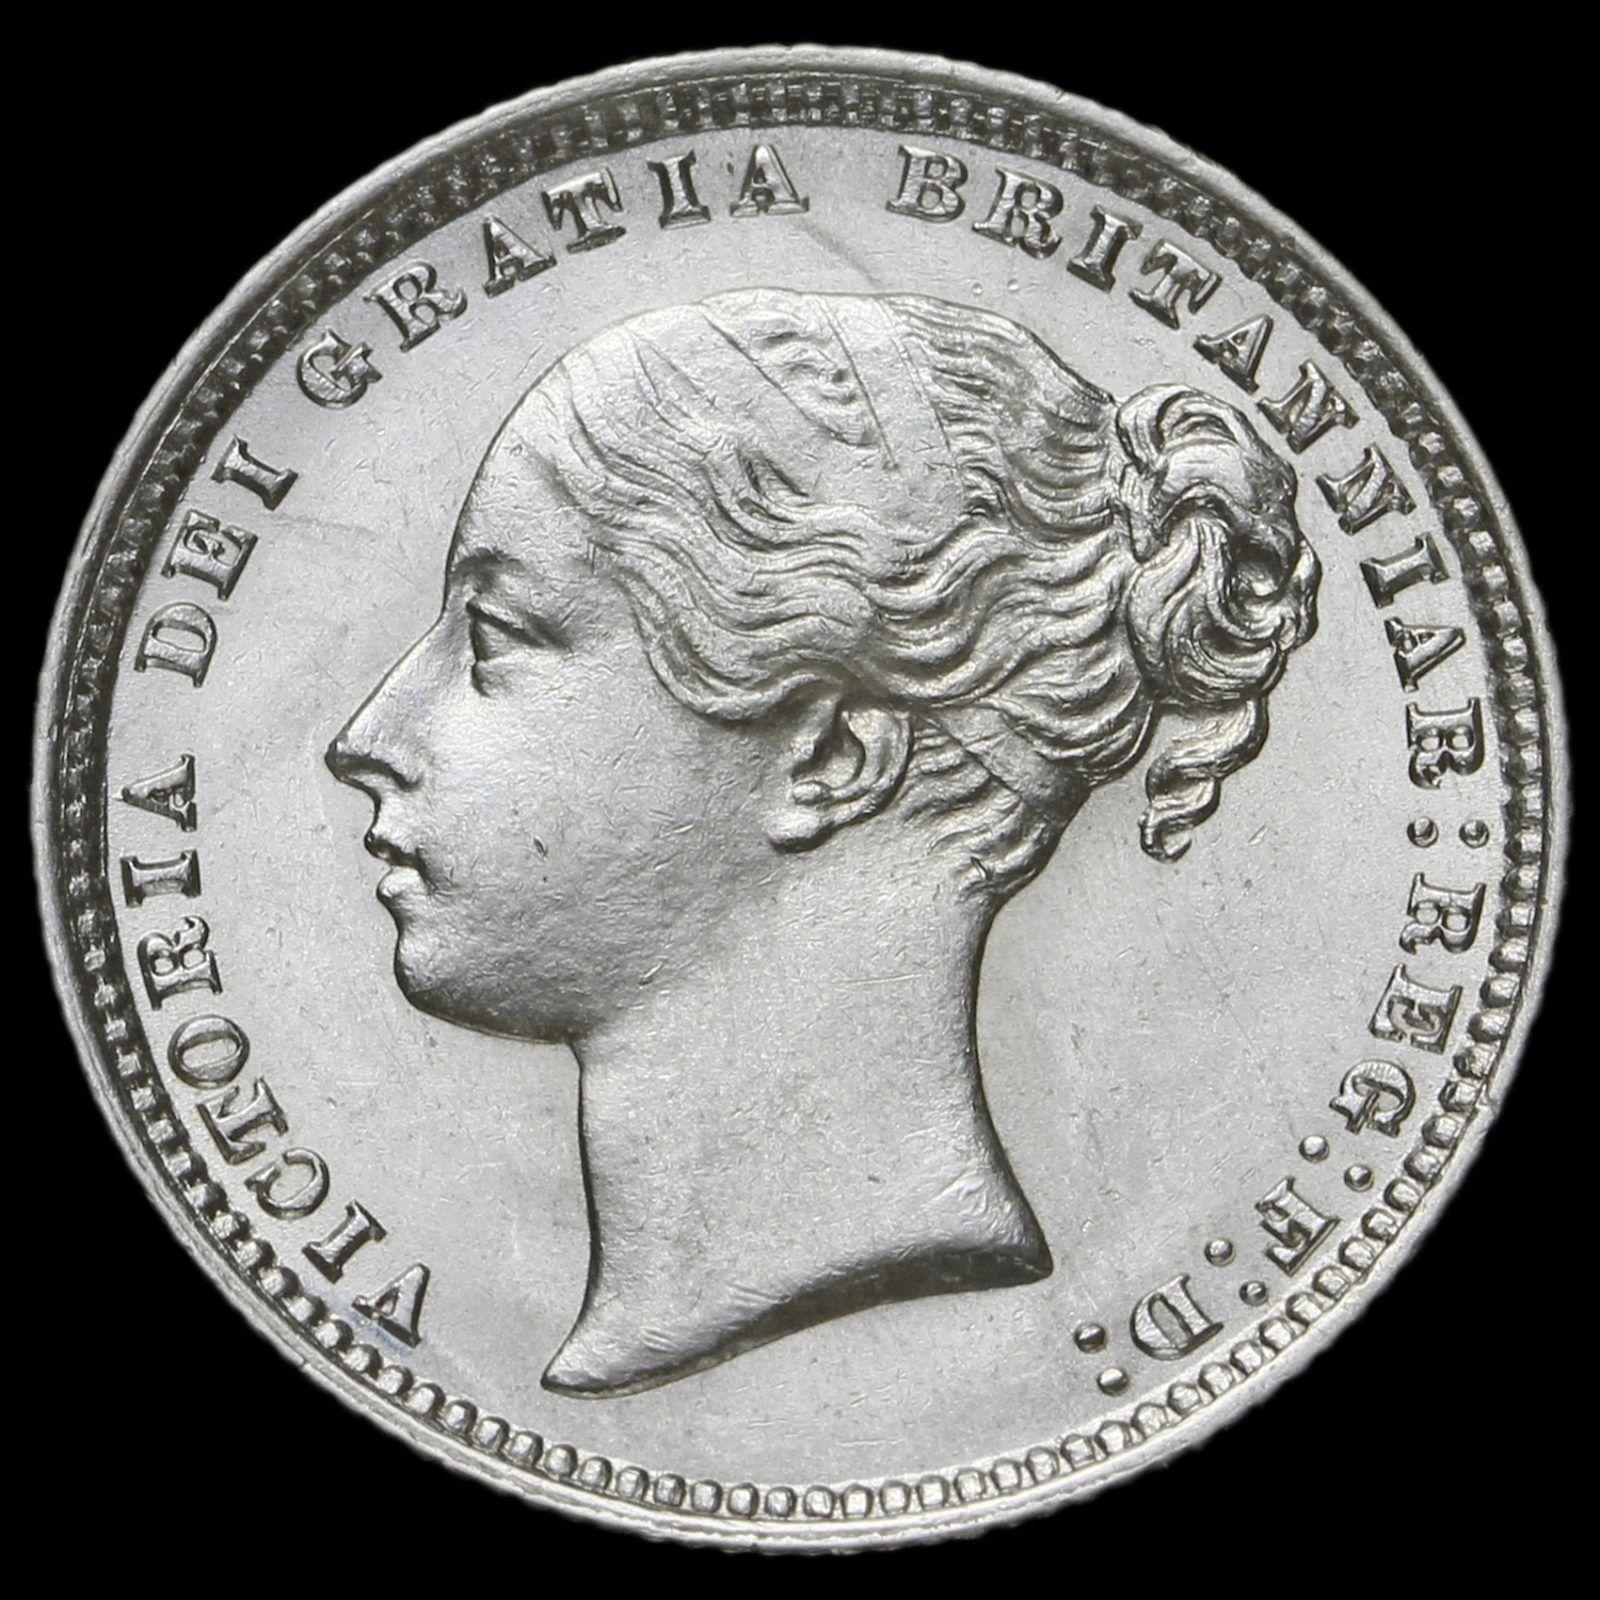 1877 Queen Victoria Young Head Silver Shilling, AU